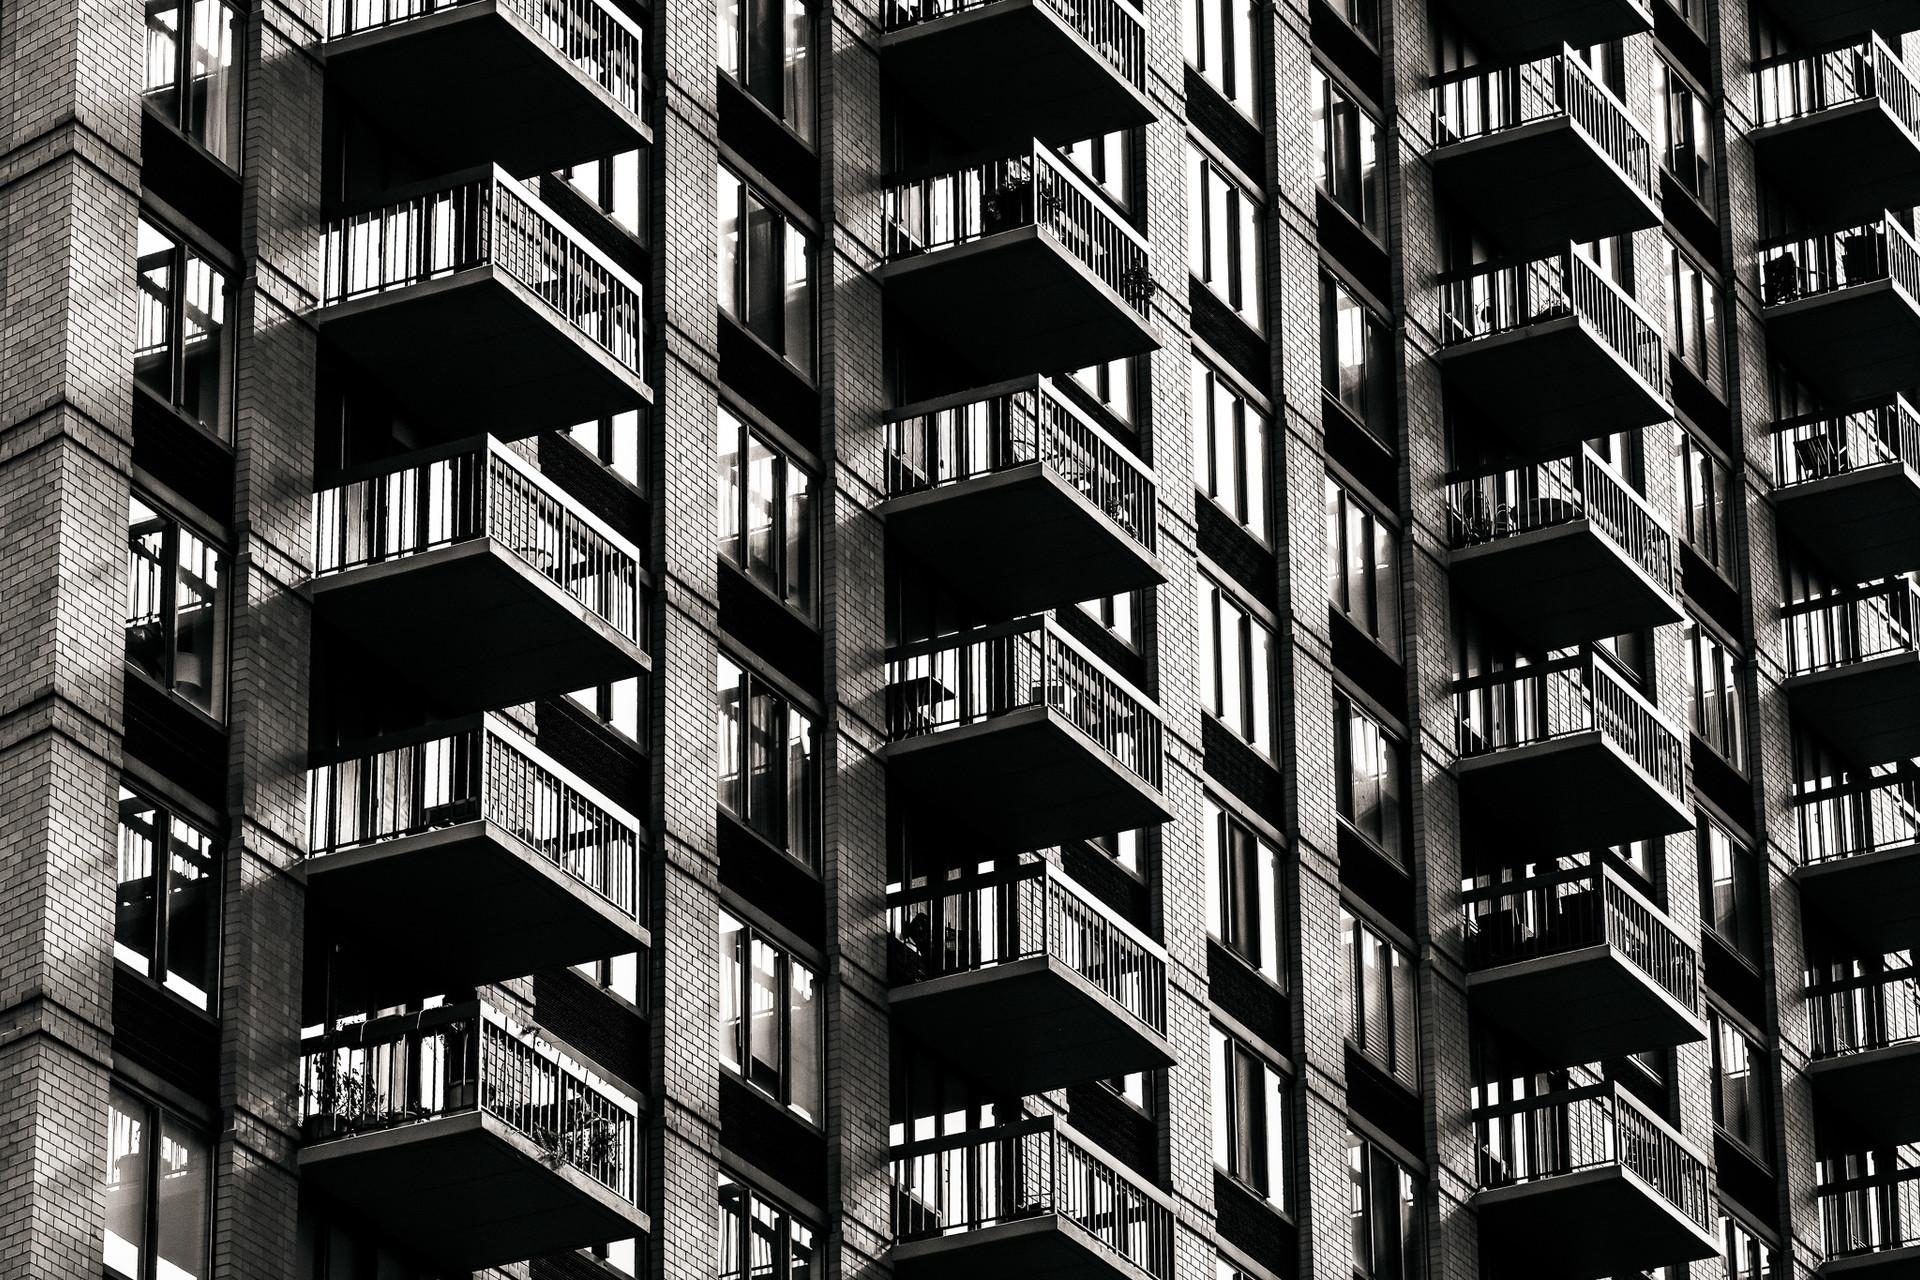 New York Architecture Series